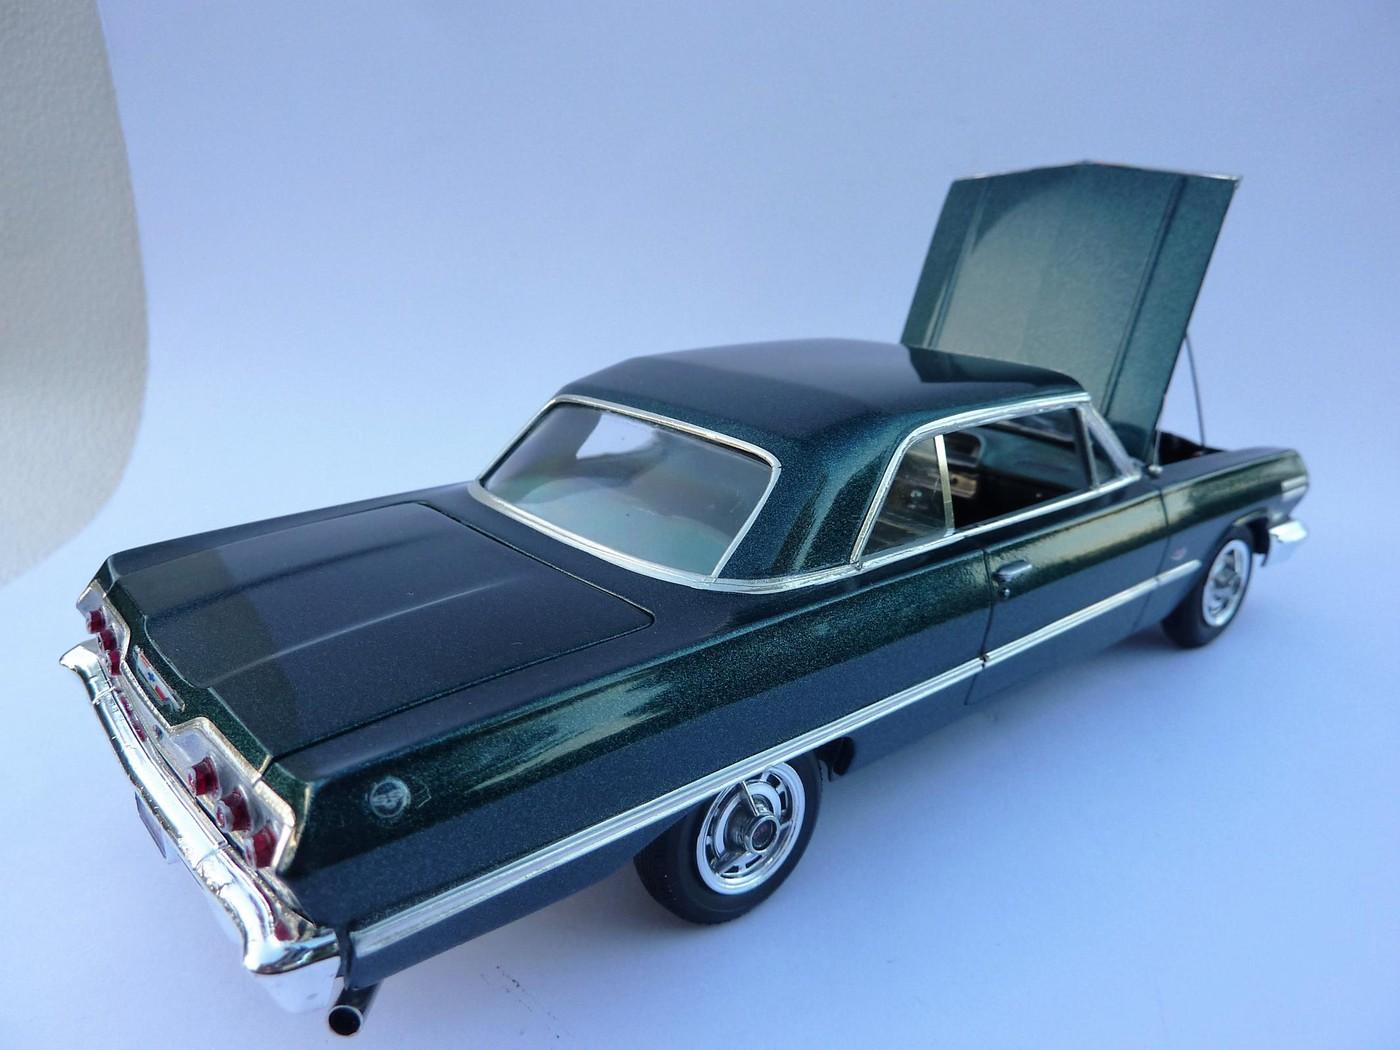 Chevrolet Impala 63 terminée - Page 2 Photo19-vi